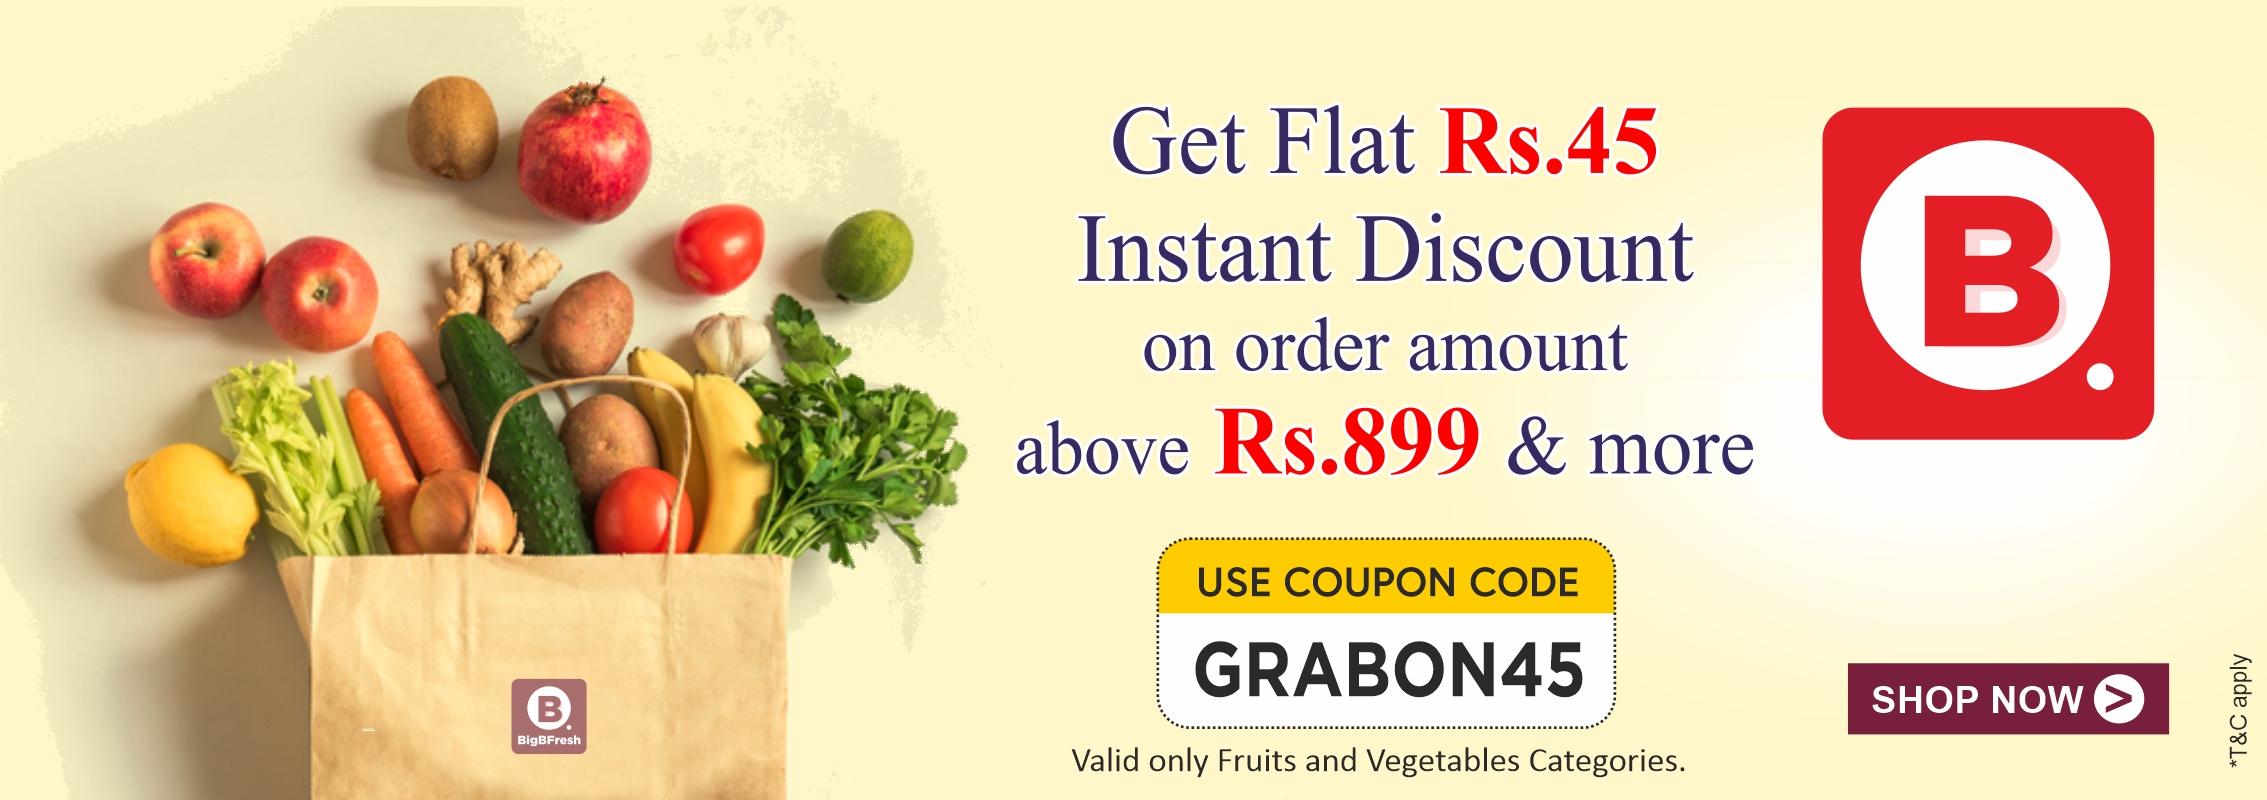 BigBFreshStore-GRABON45-Order Value 899 and More-Vegetables and Fruits Only